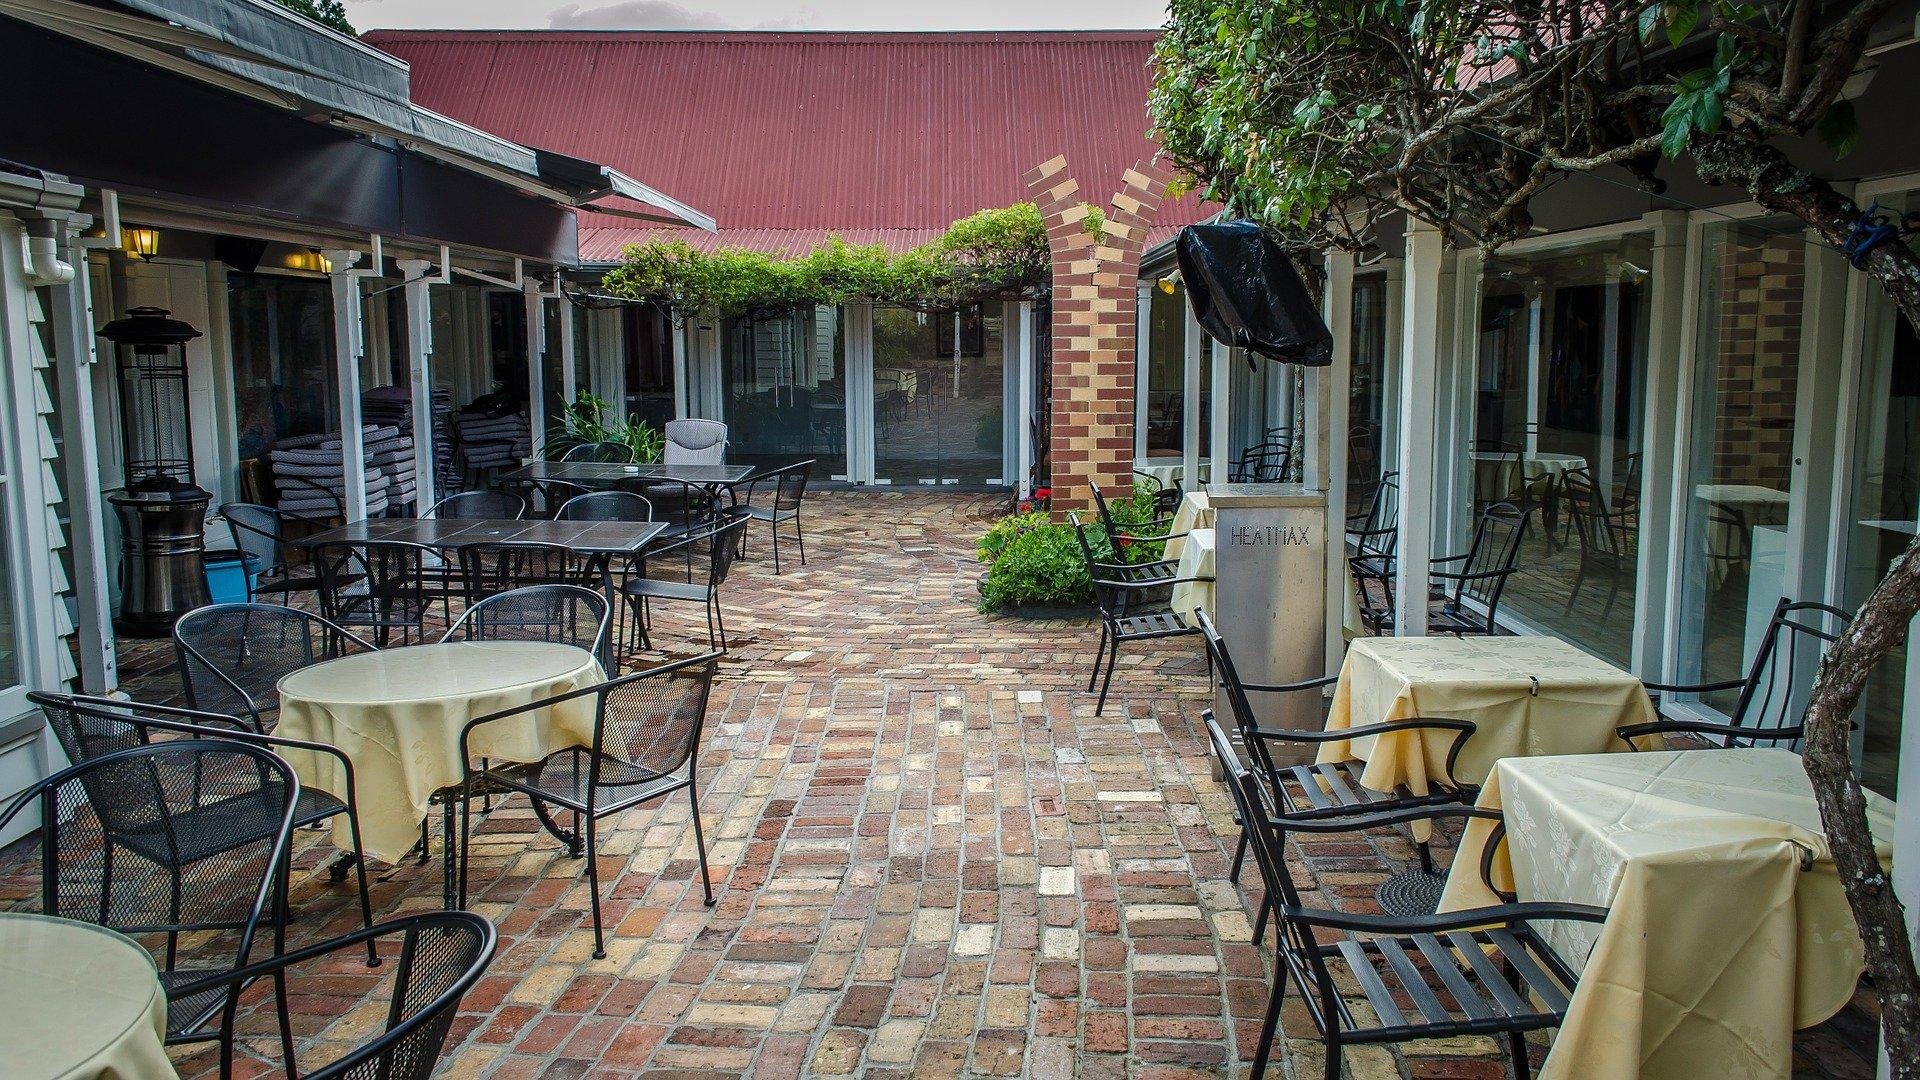 Restauranteros insisten en ampliar horario